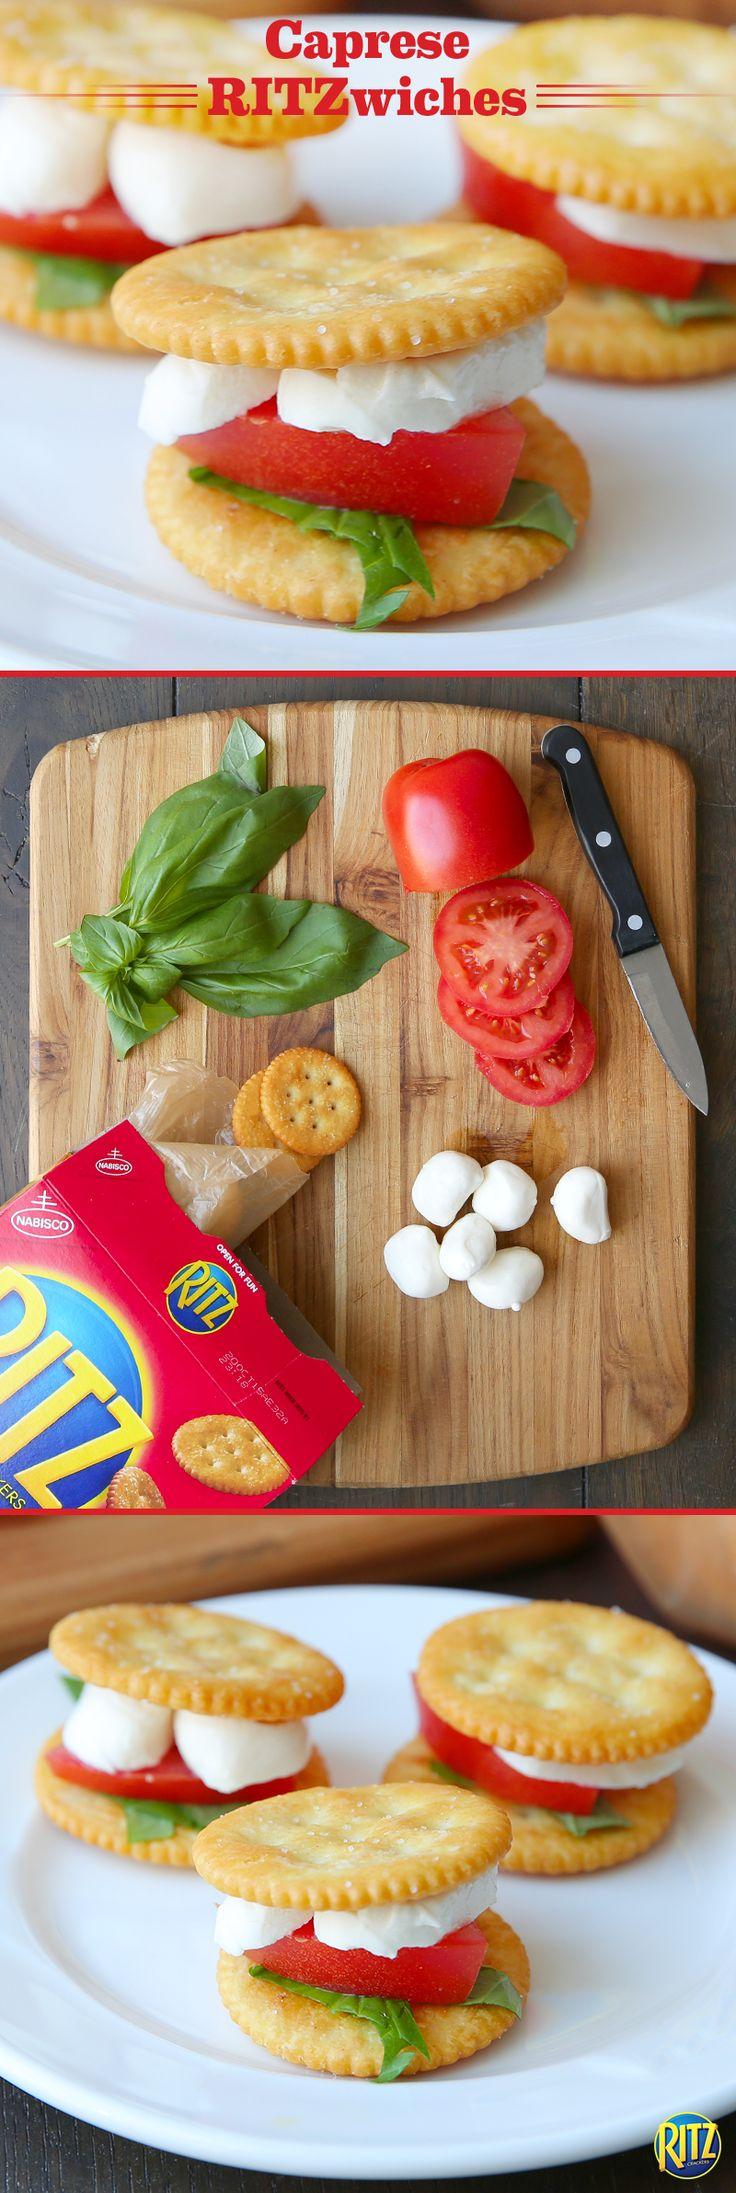 m u00e1s de 20 ideas incre u00edbles sobre recetas de galletas ritz en pinterest